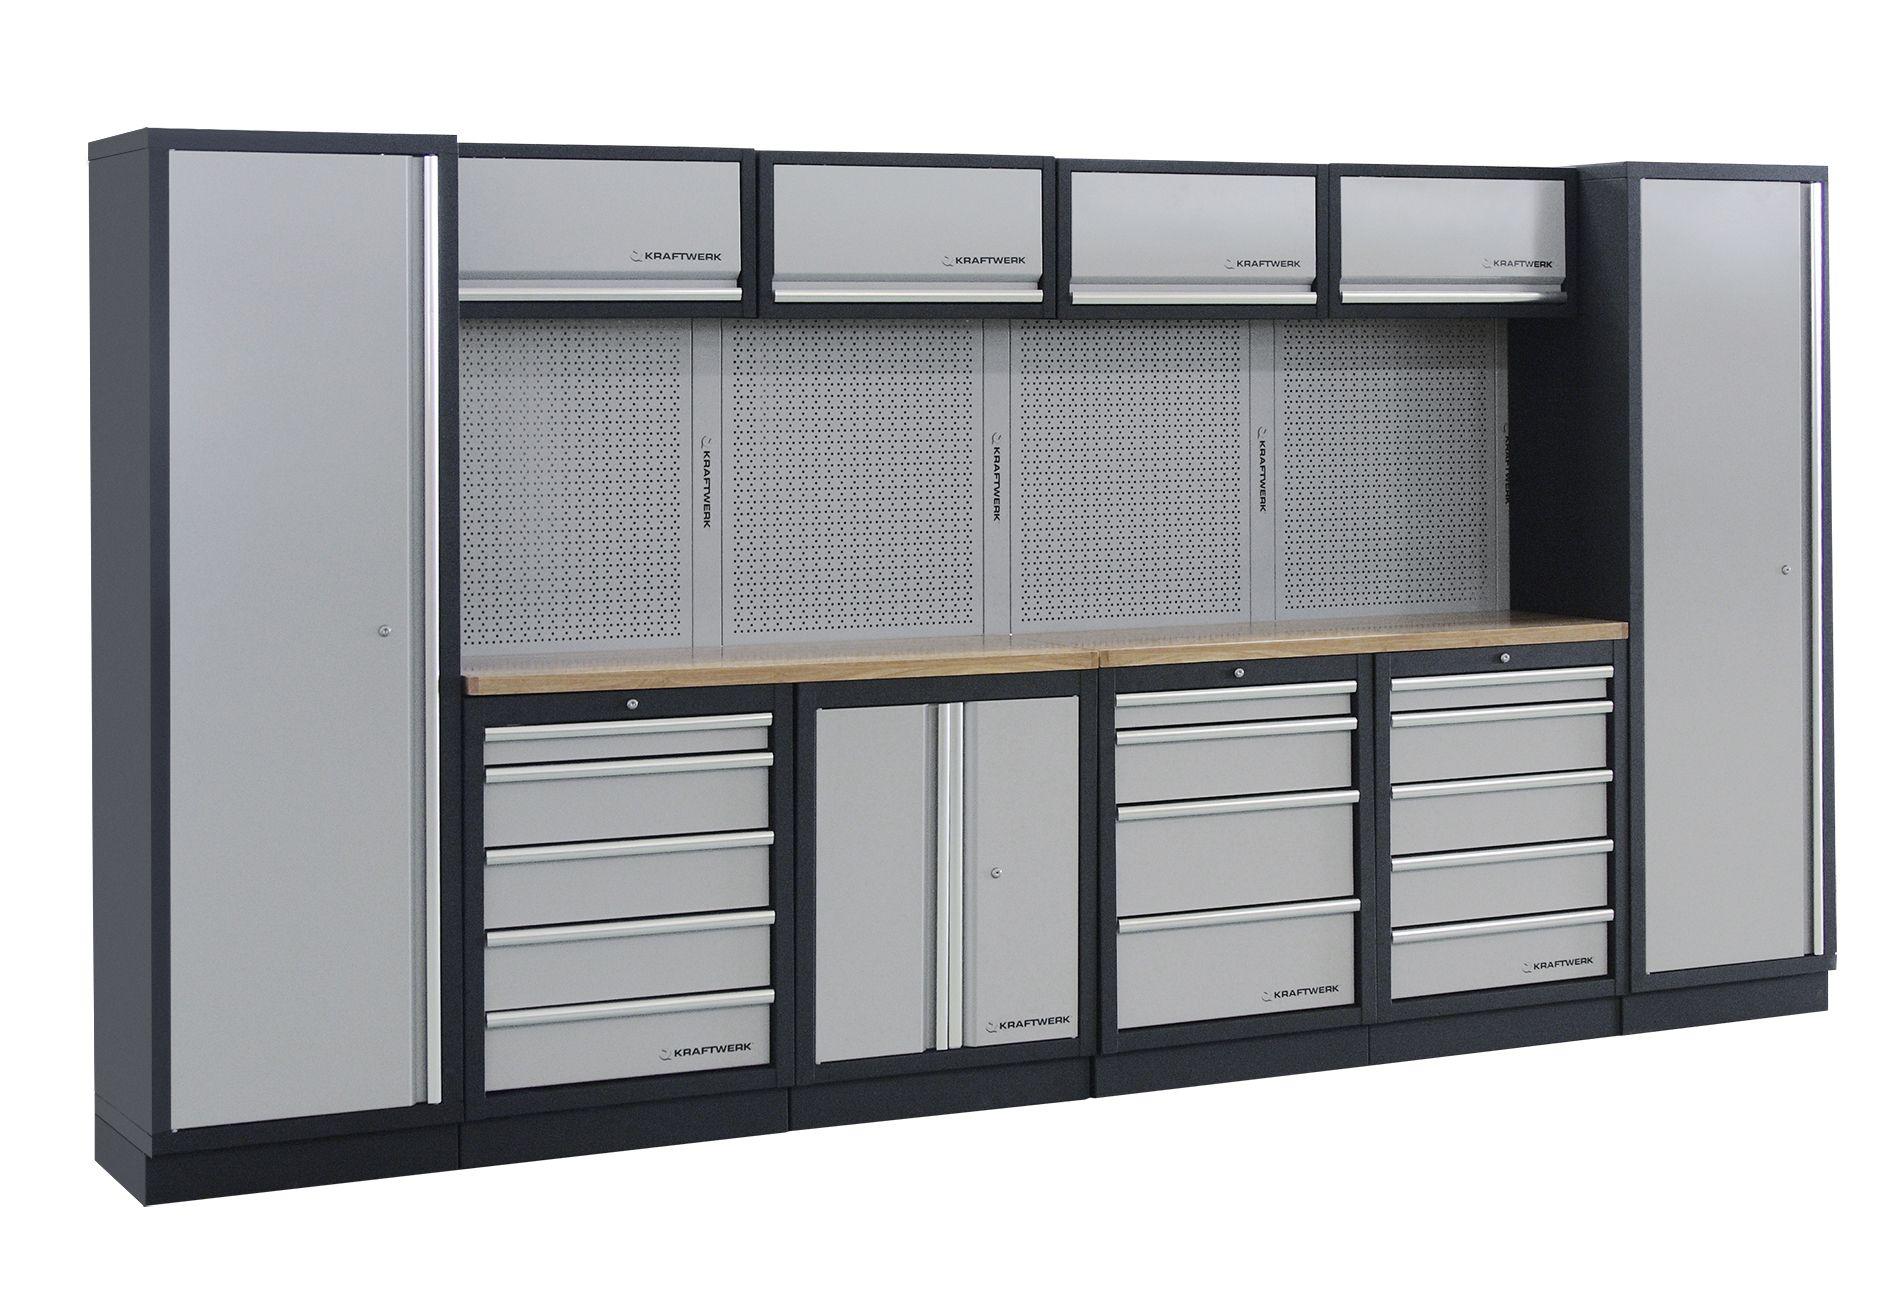 Mobilier D Atelier De Scrap Mobilier D Atelier Servante Charriot Meuble Rangement Armoire Rangement Garage Rangement Garage